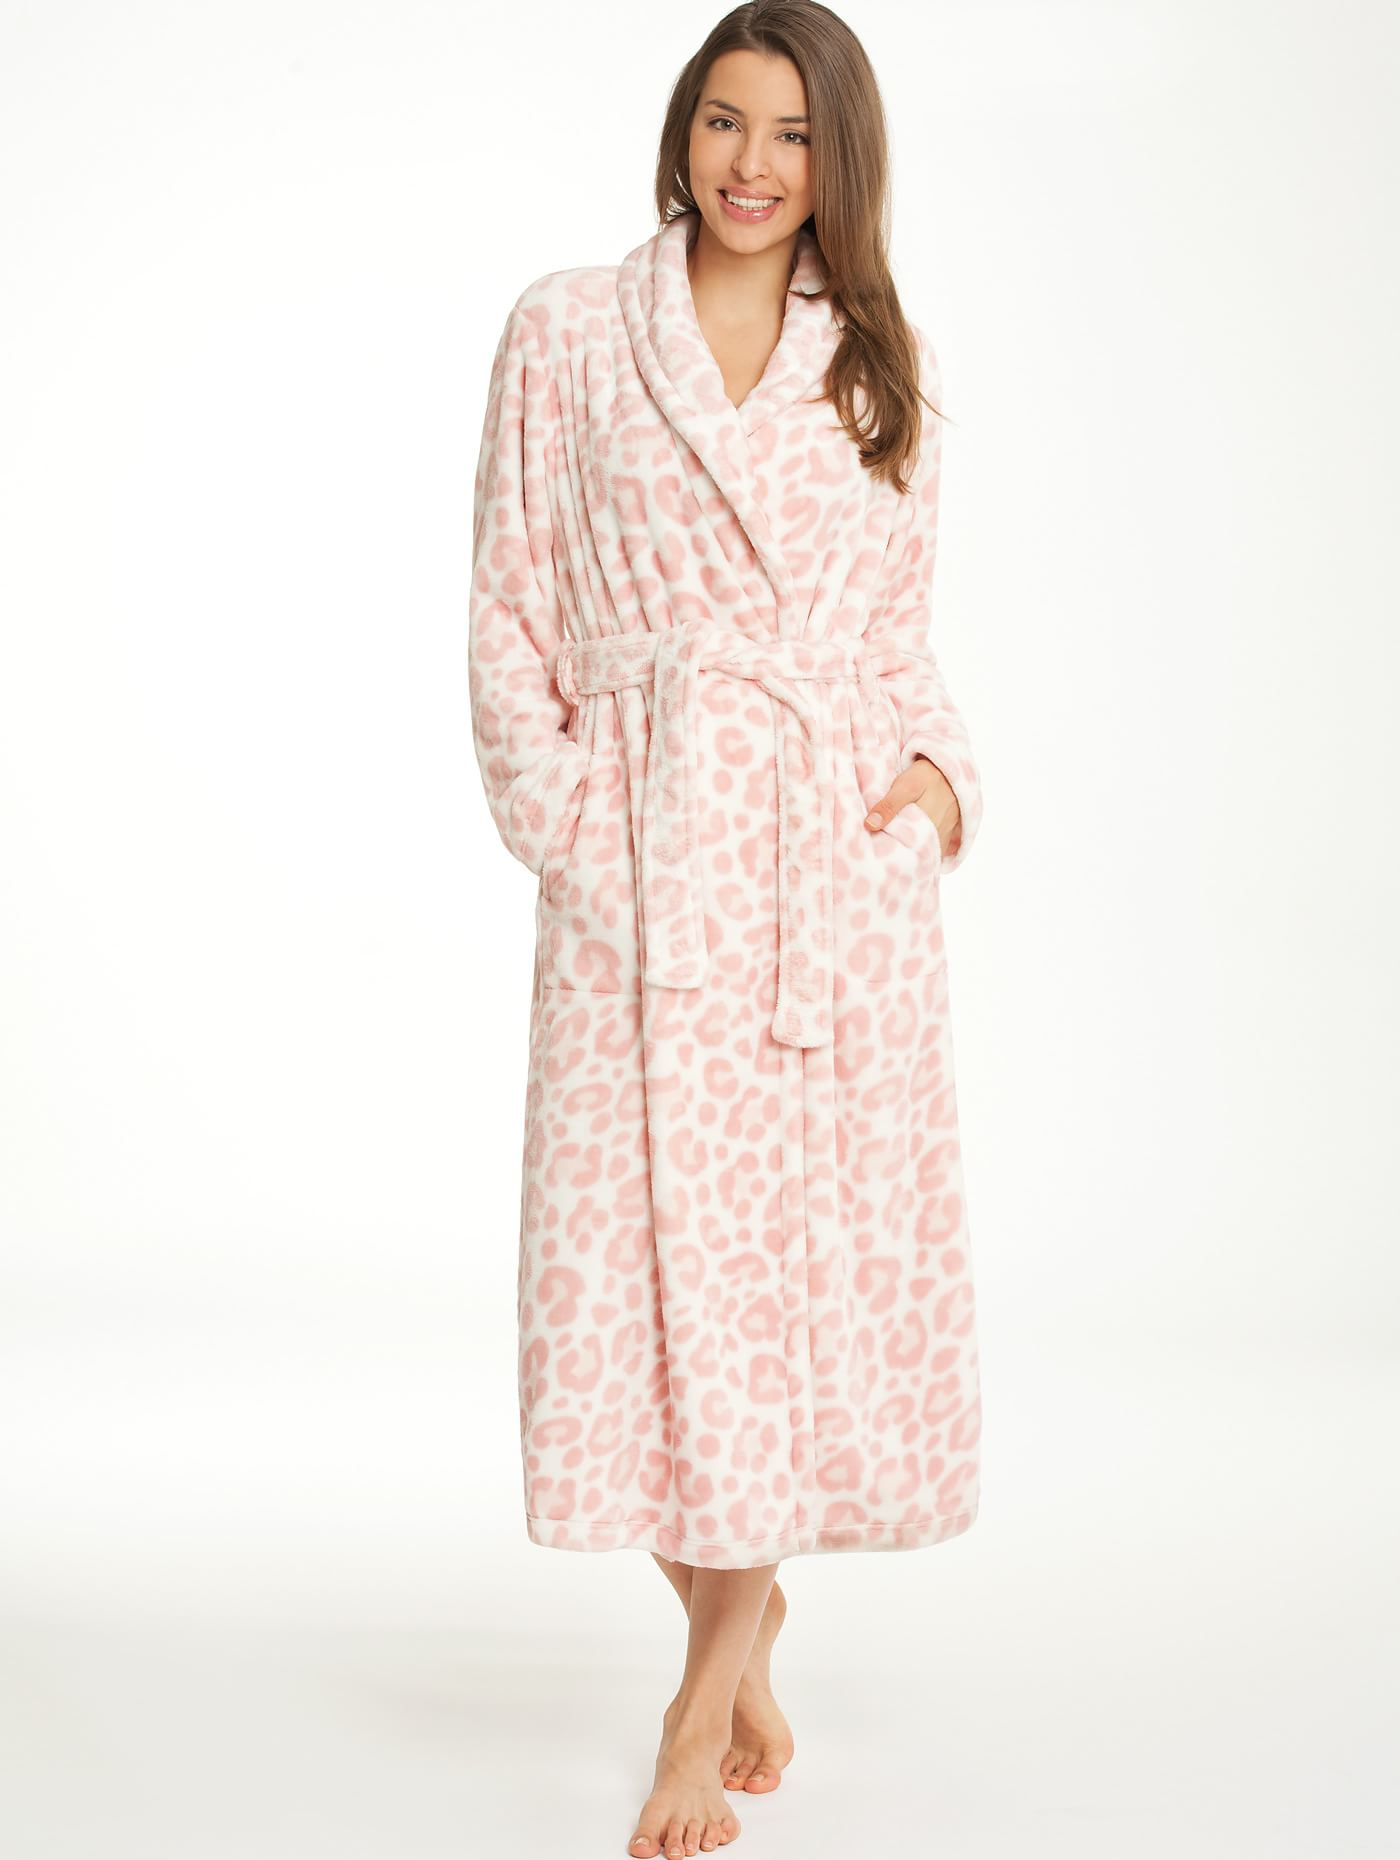 Robe de Chambre Silence Taubert 114 Caroline Lingerie